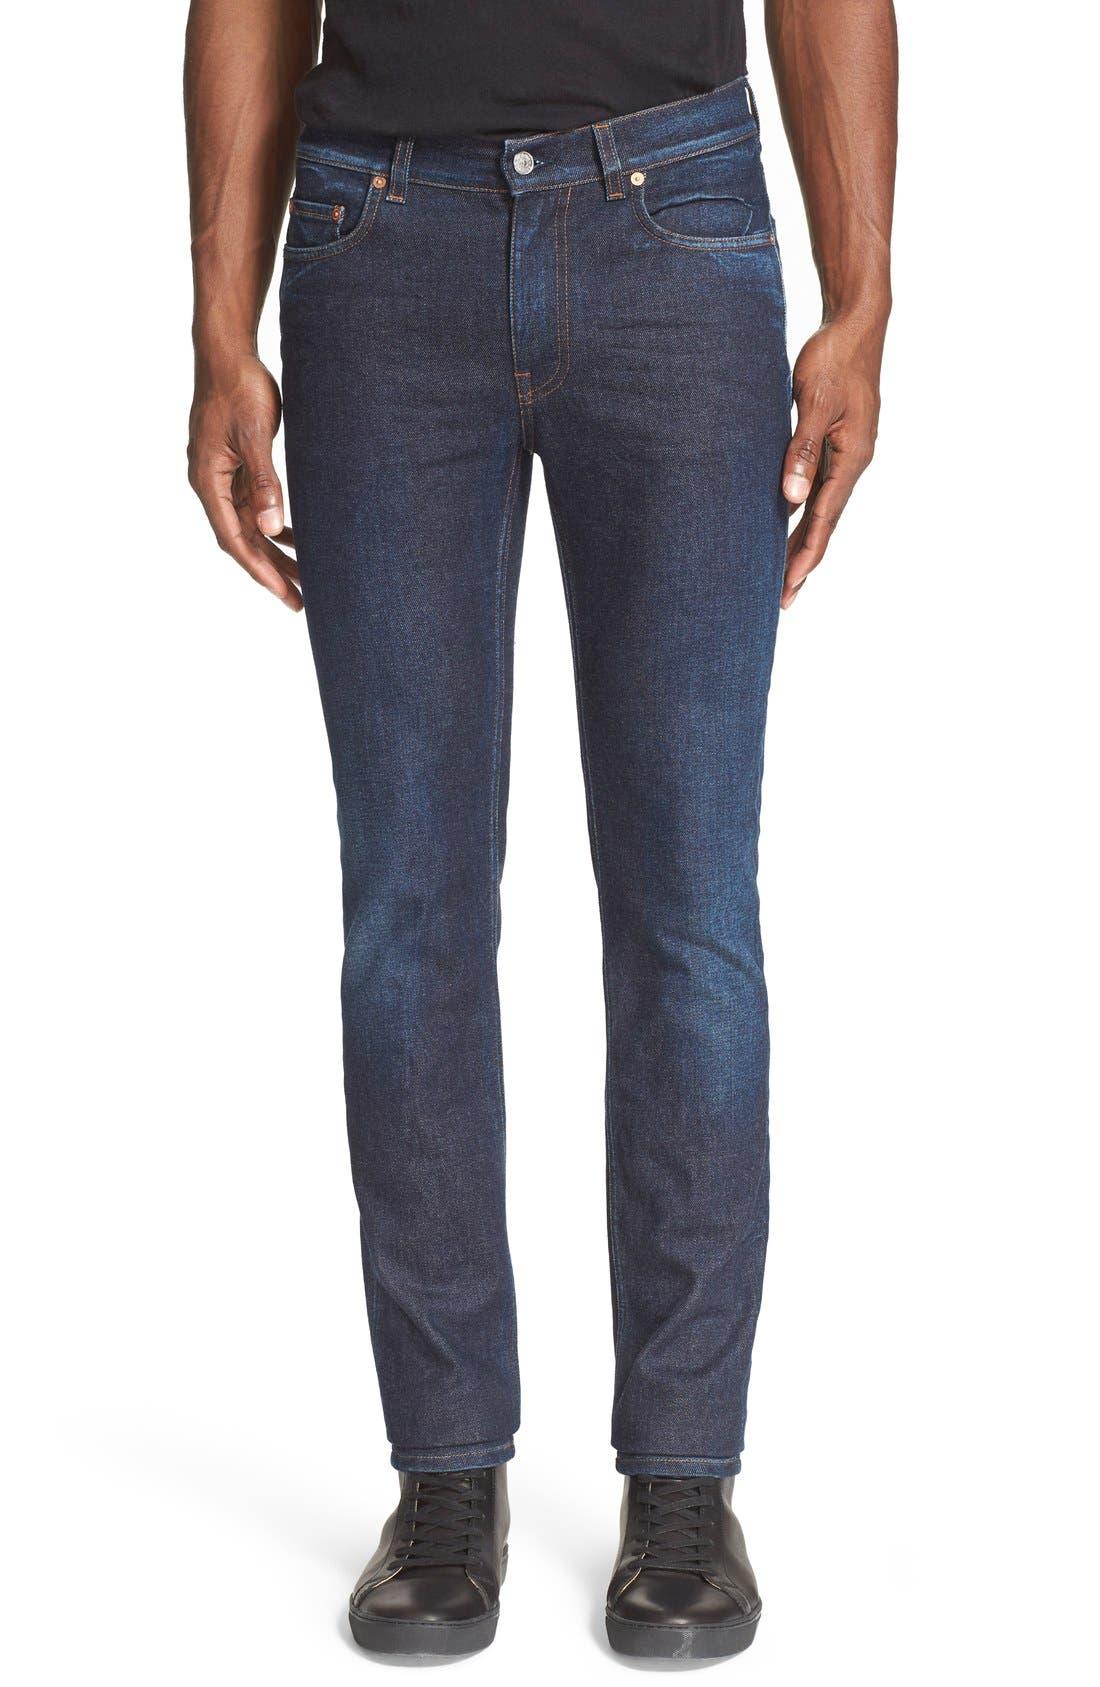 ACNE STUDIOS 'Ace' Slim Straight Leg Jeans